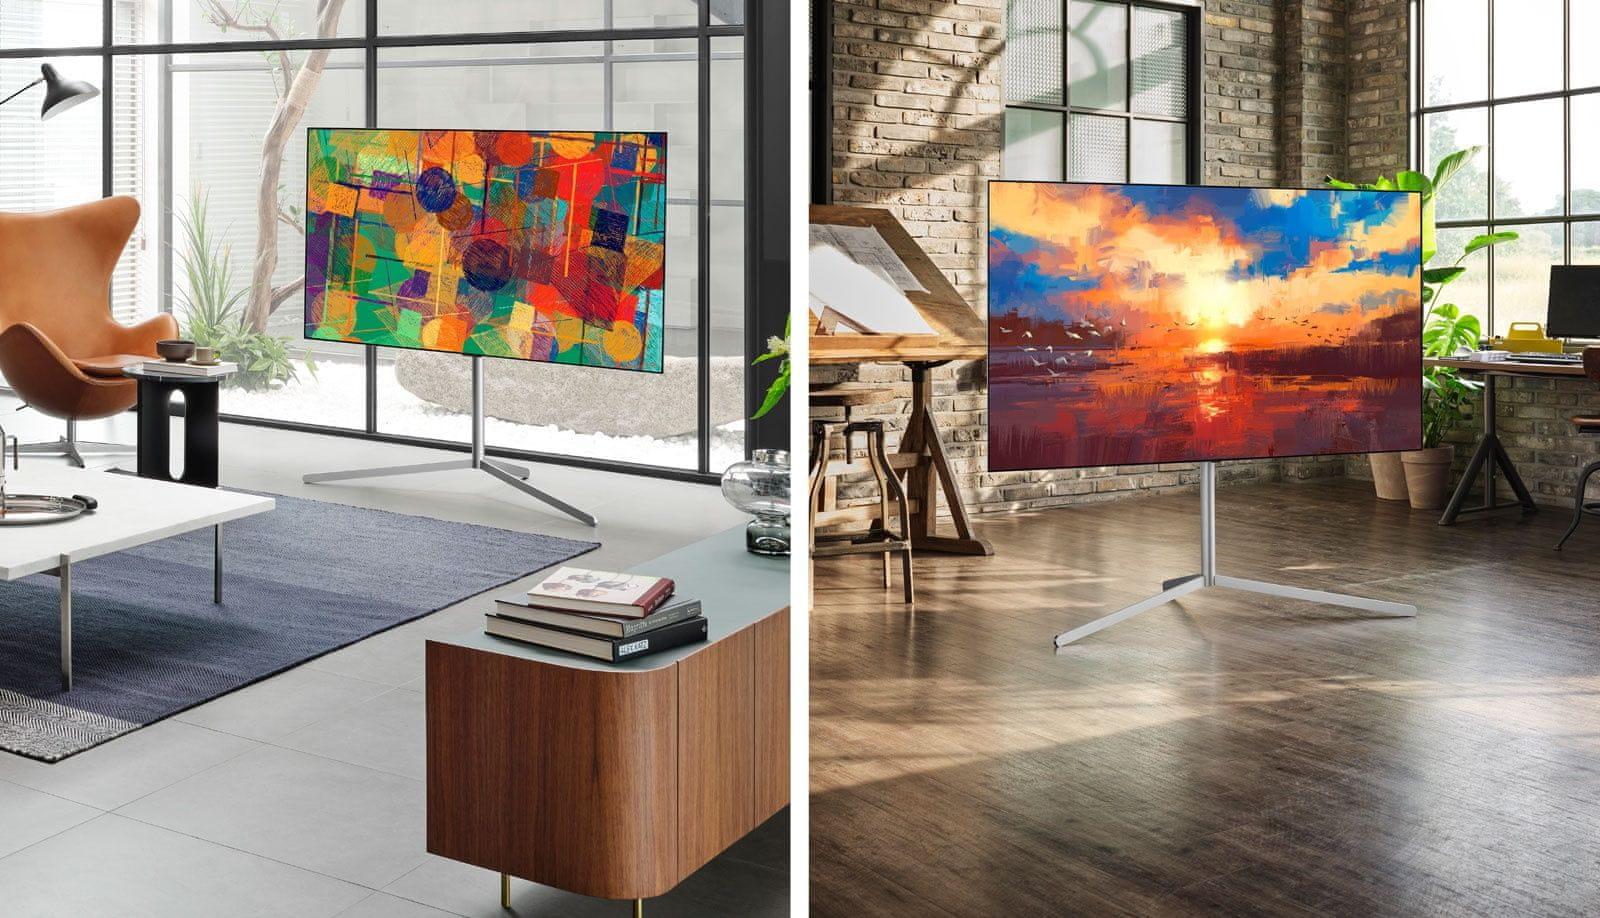 LG TV televízor OLED 4K 2021 stojan gallery